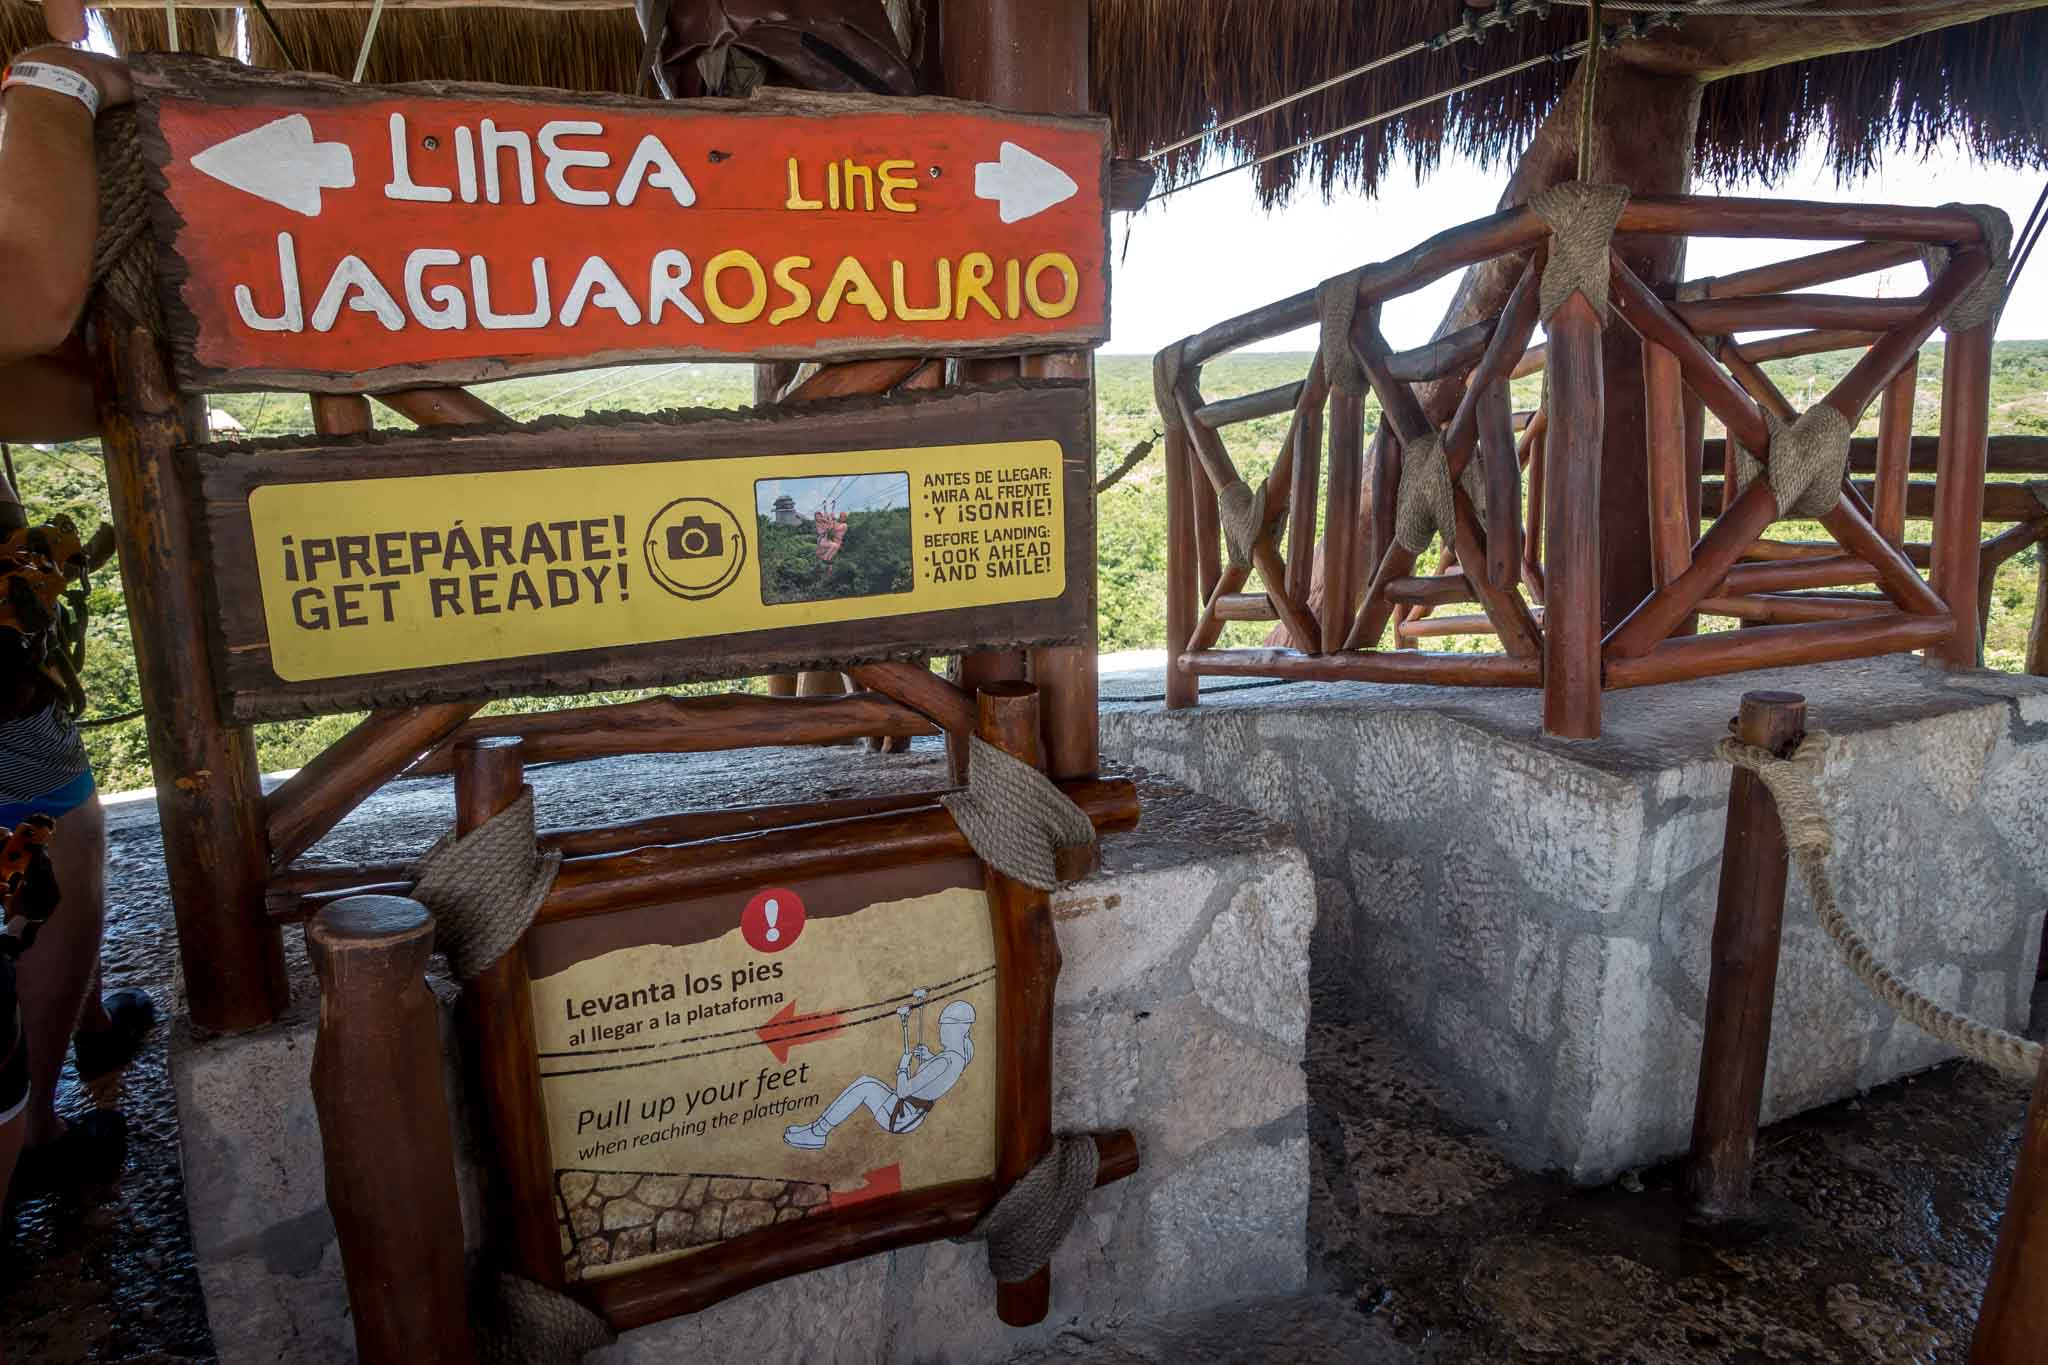 Sign for the jaguar zip line